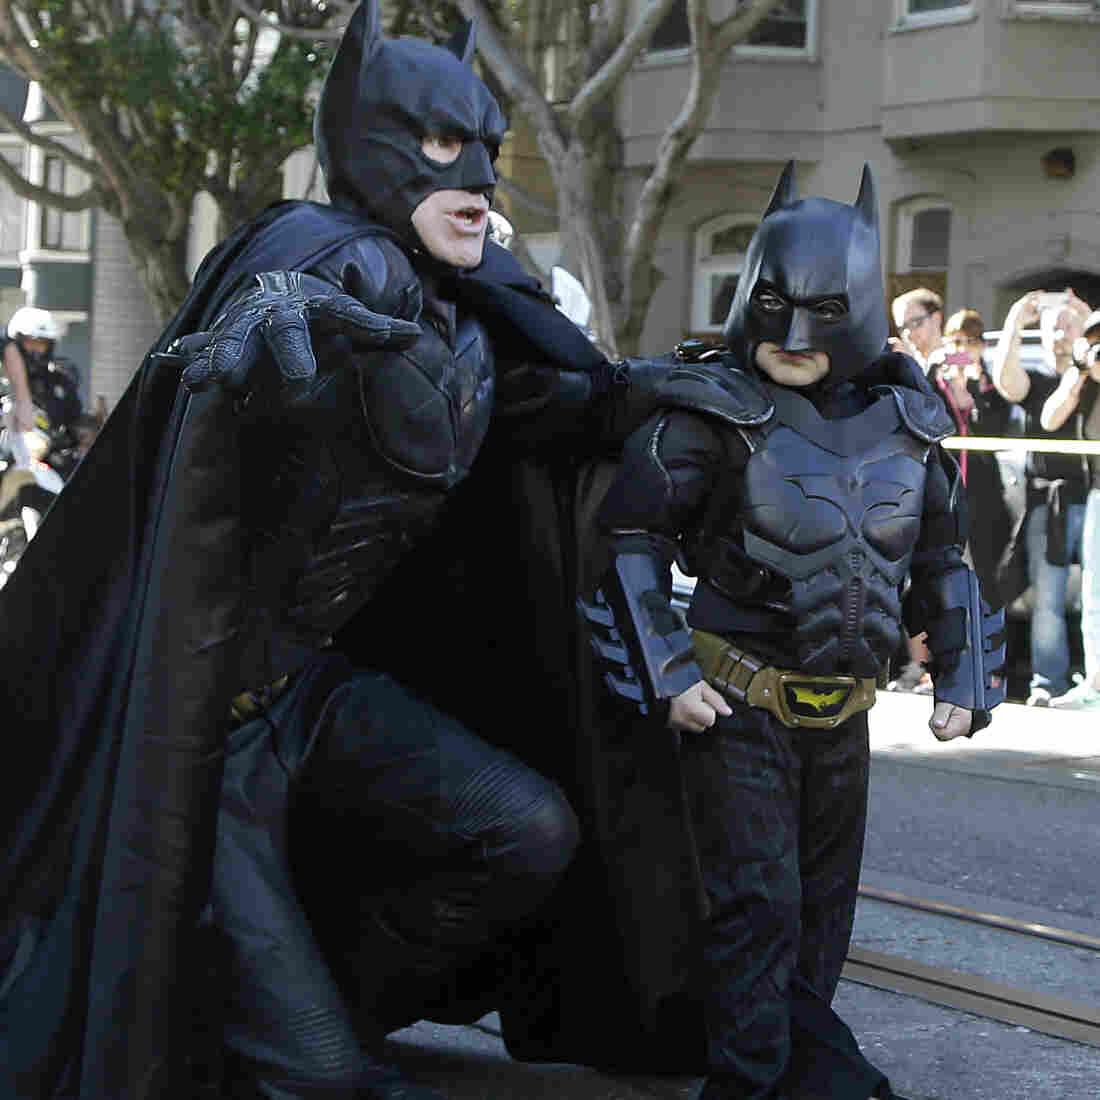 Holy Empathy! Batkid Lives Superhero Dream In San Francisco